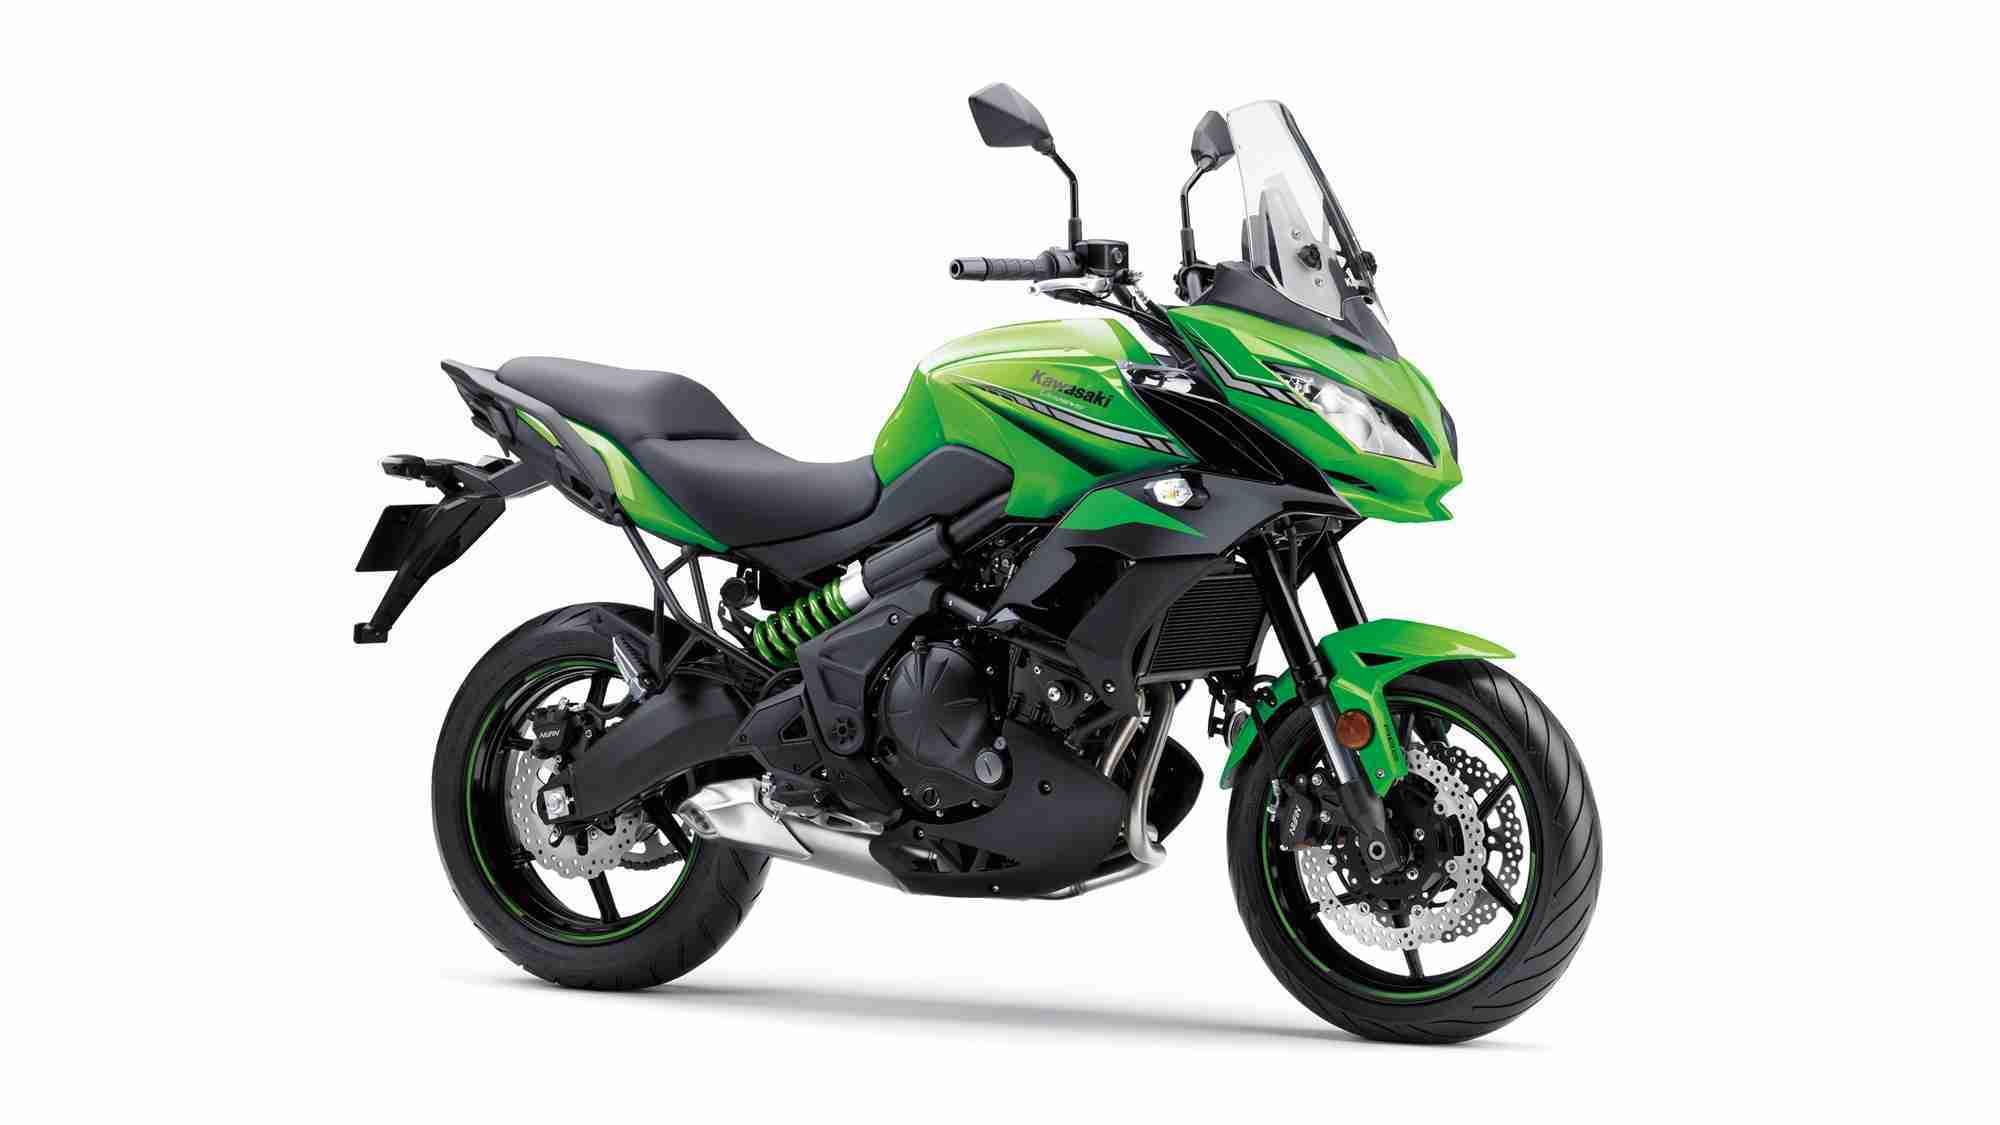 2019 Kawasaki Versys 650 new colour option